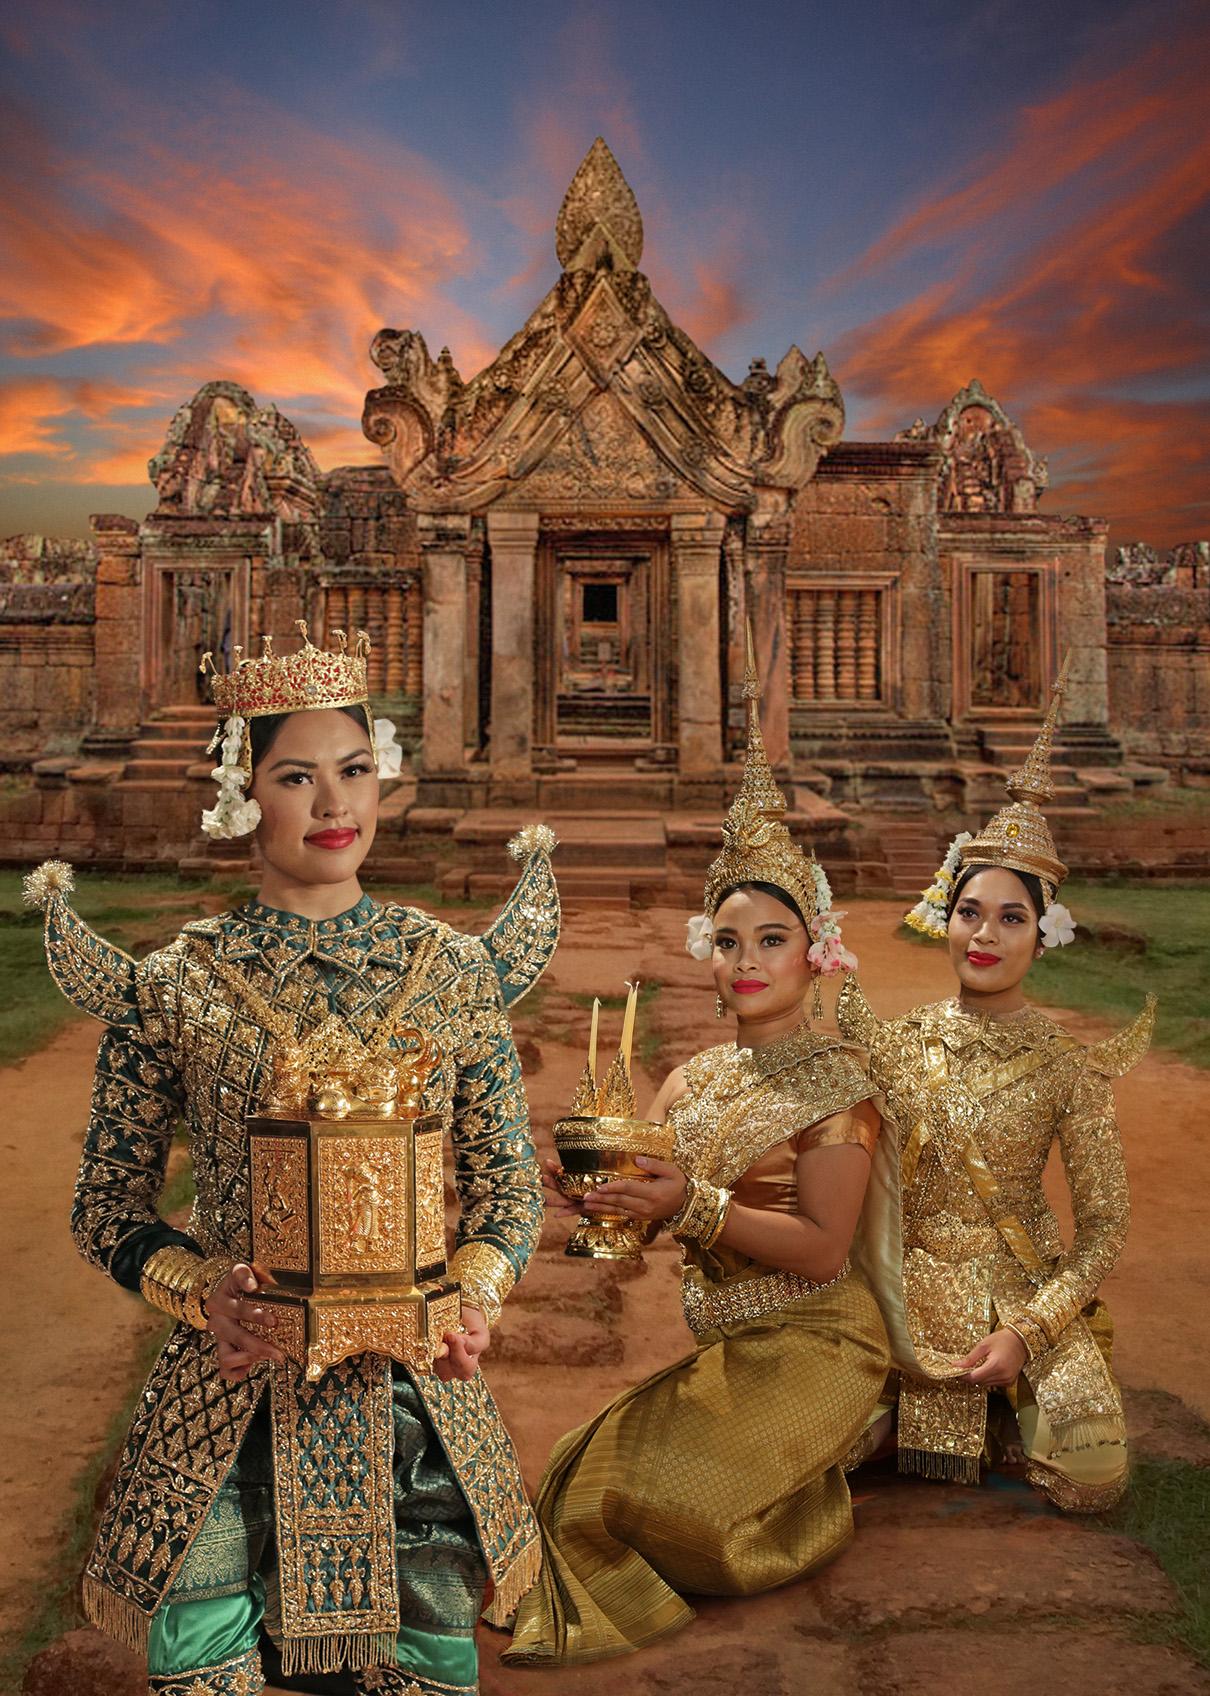 Preah Thoung Neang Neak